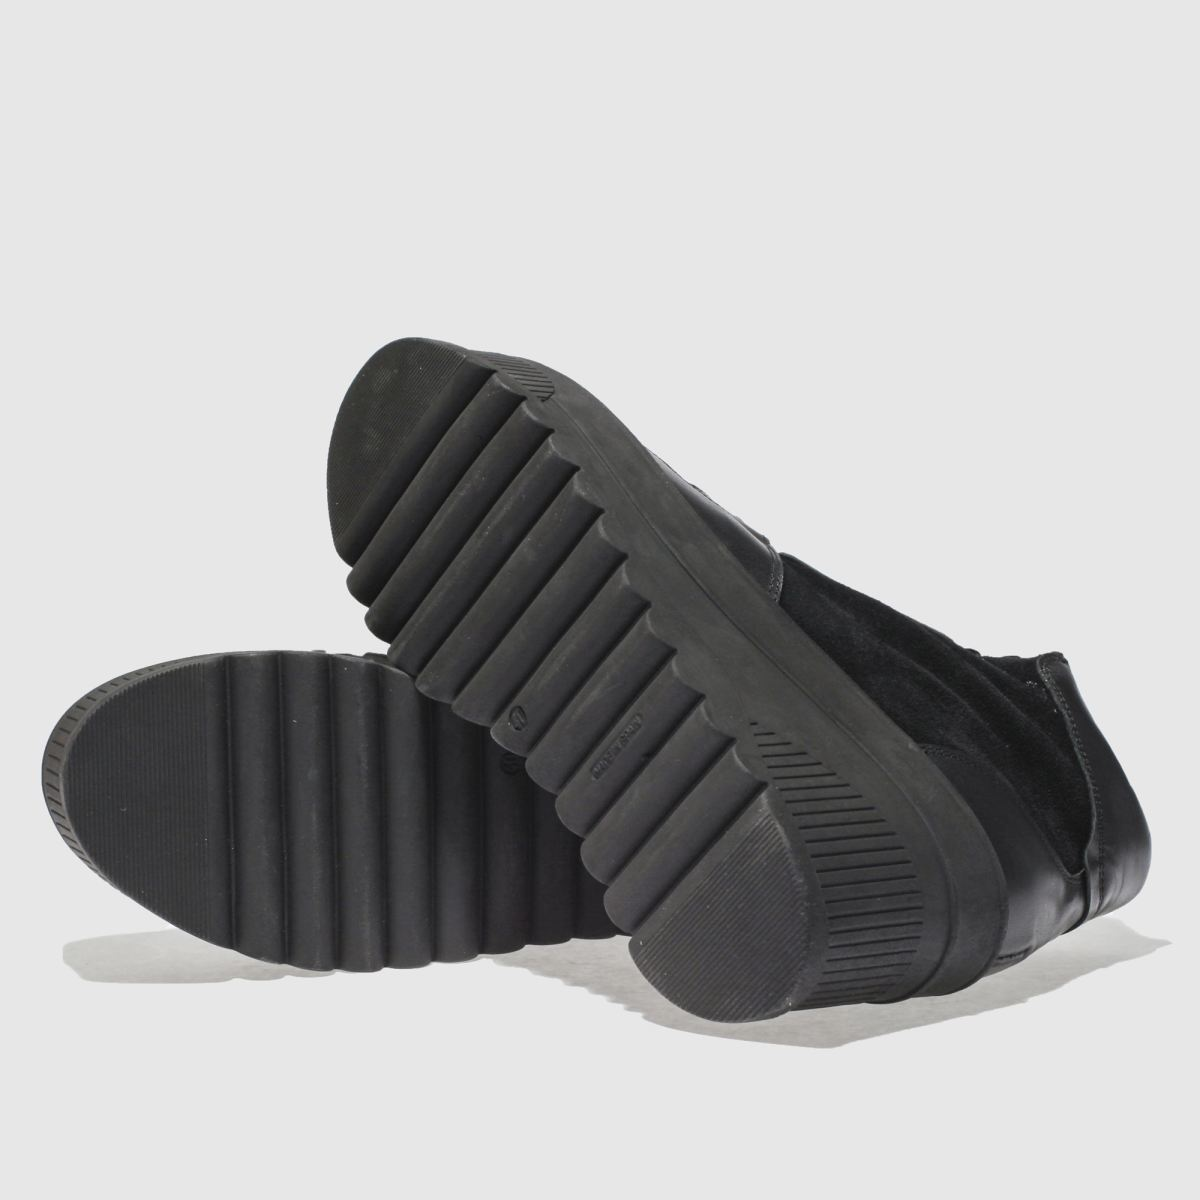 Damen Schwarz schuh Gute Fierce Boots | schuh Gute schuh Qualität beliebte Schuhe 445655